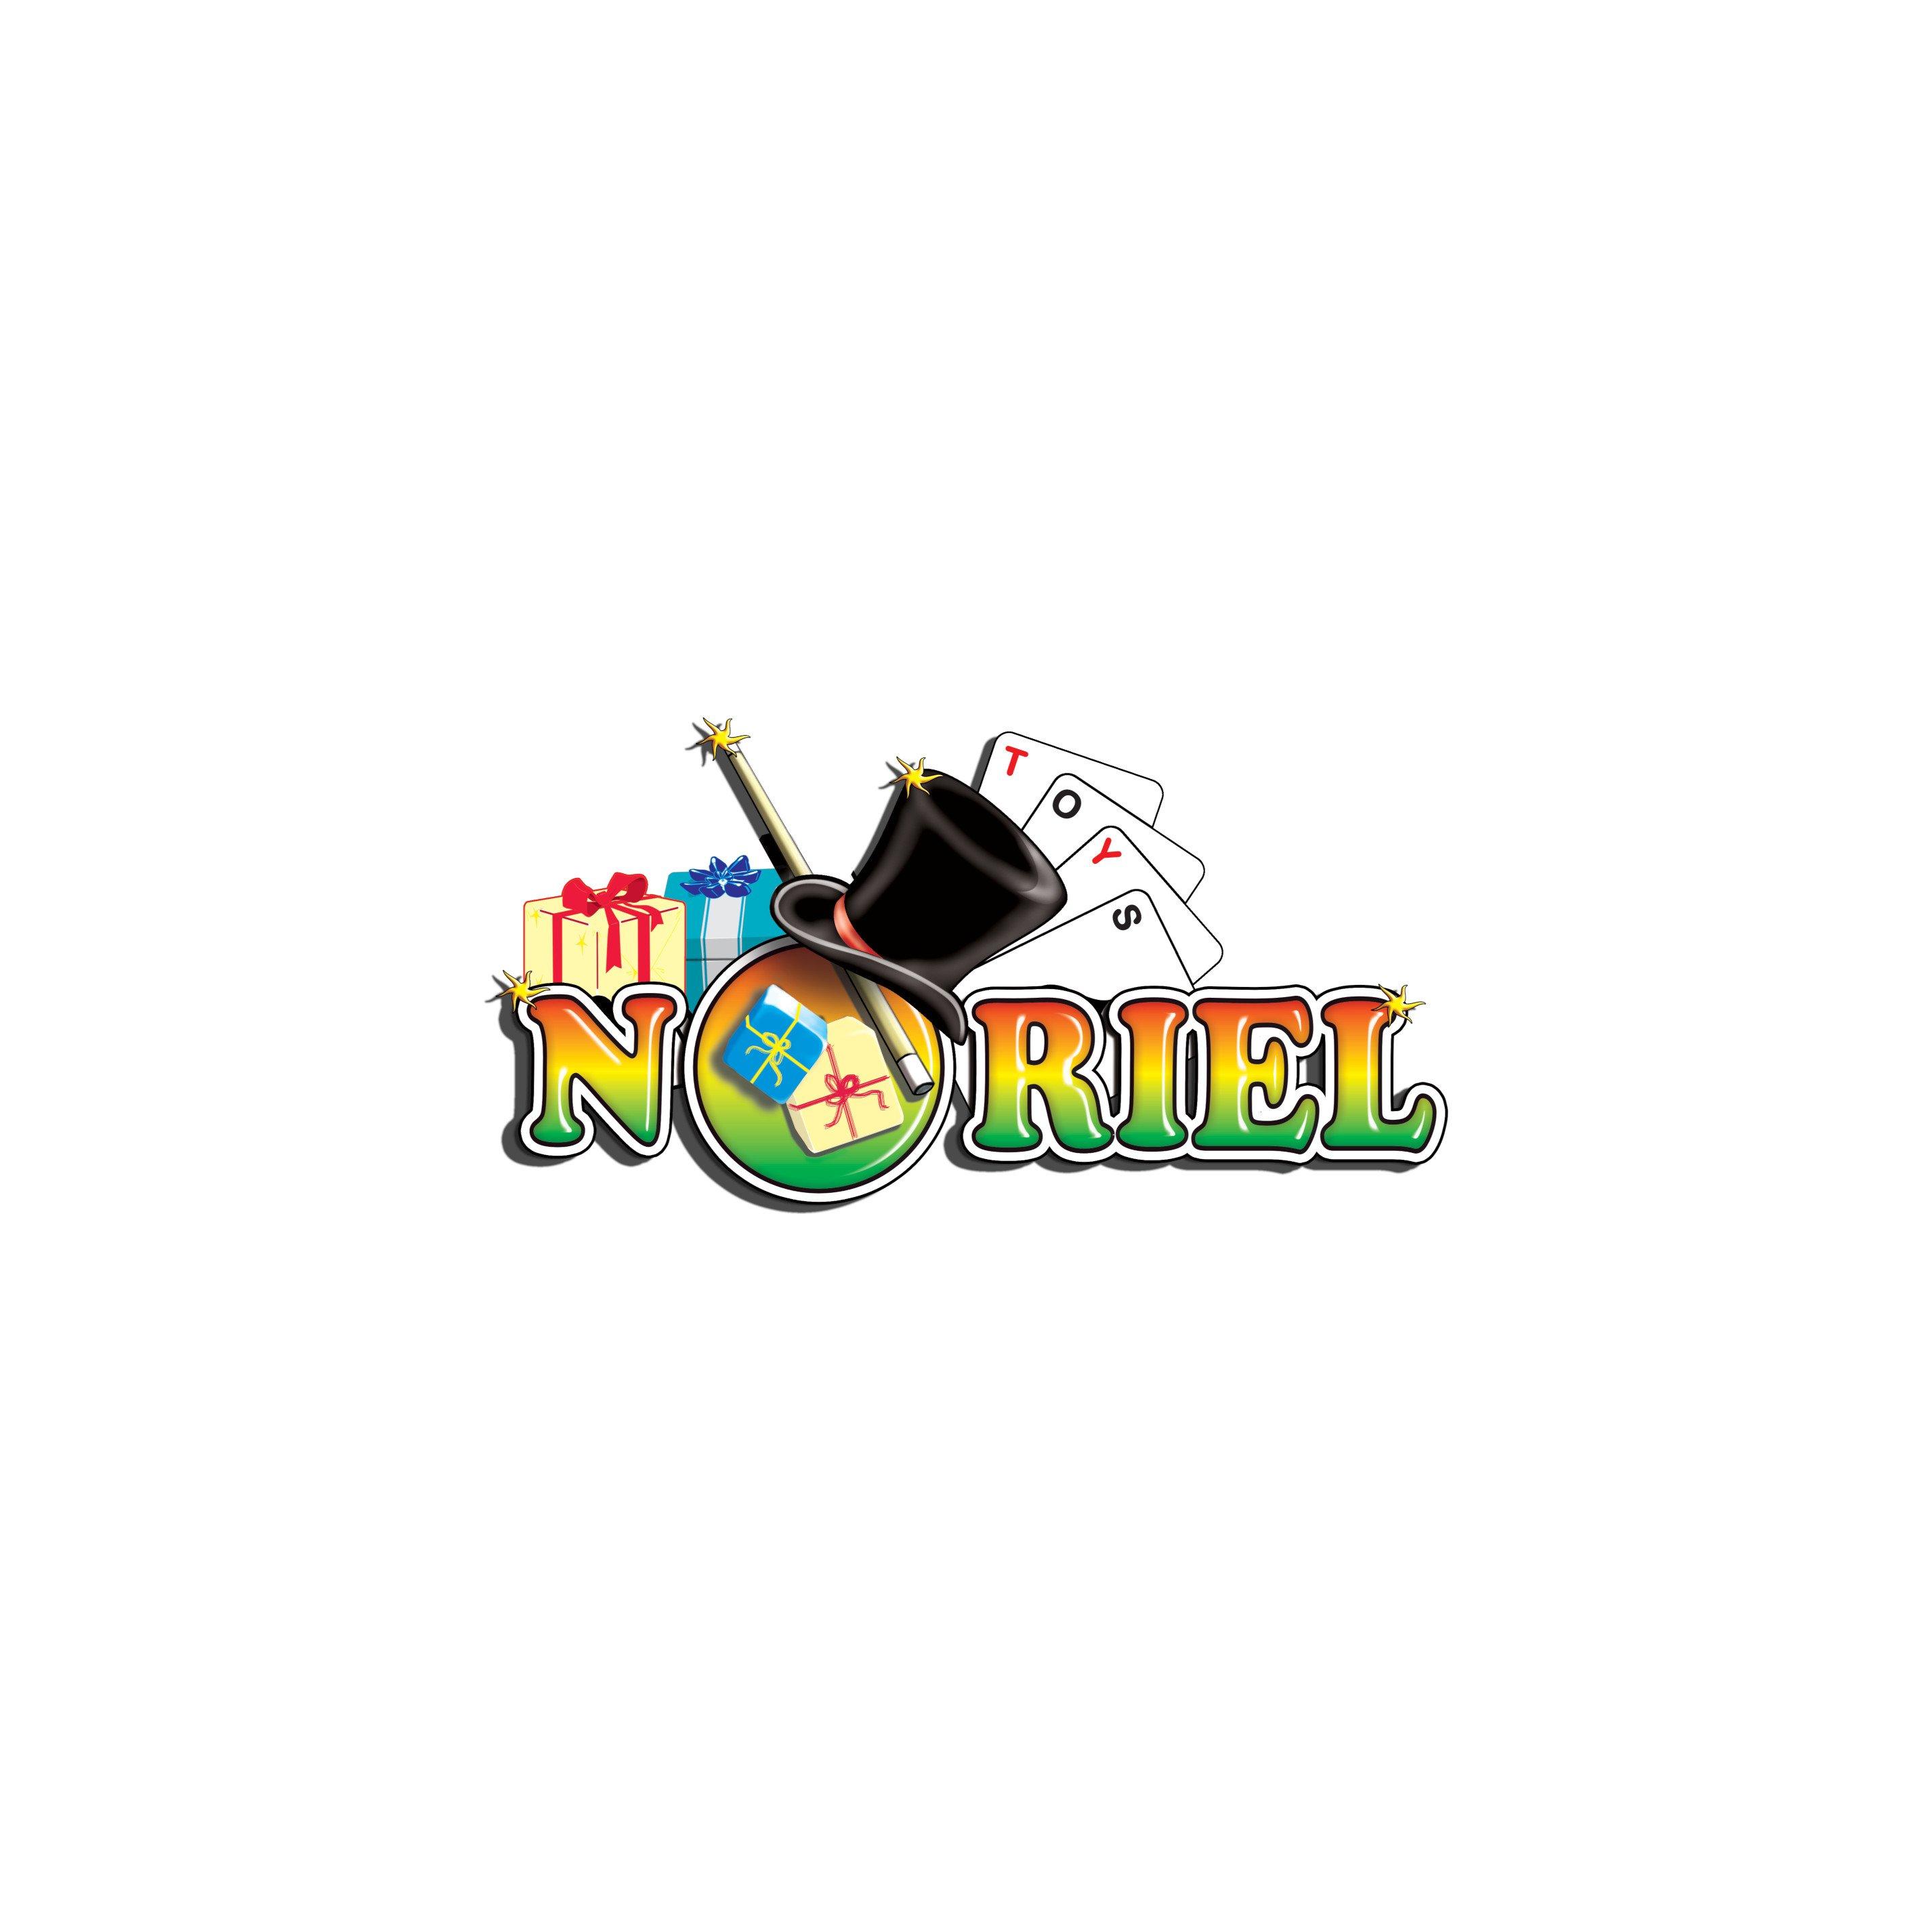 Baloane de umflat  Oonies S3, Rainbow Fantasy